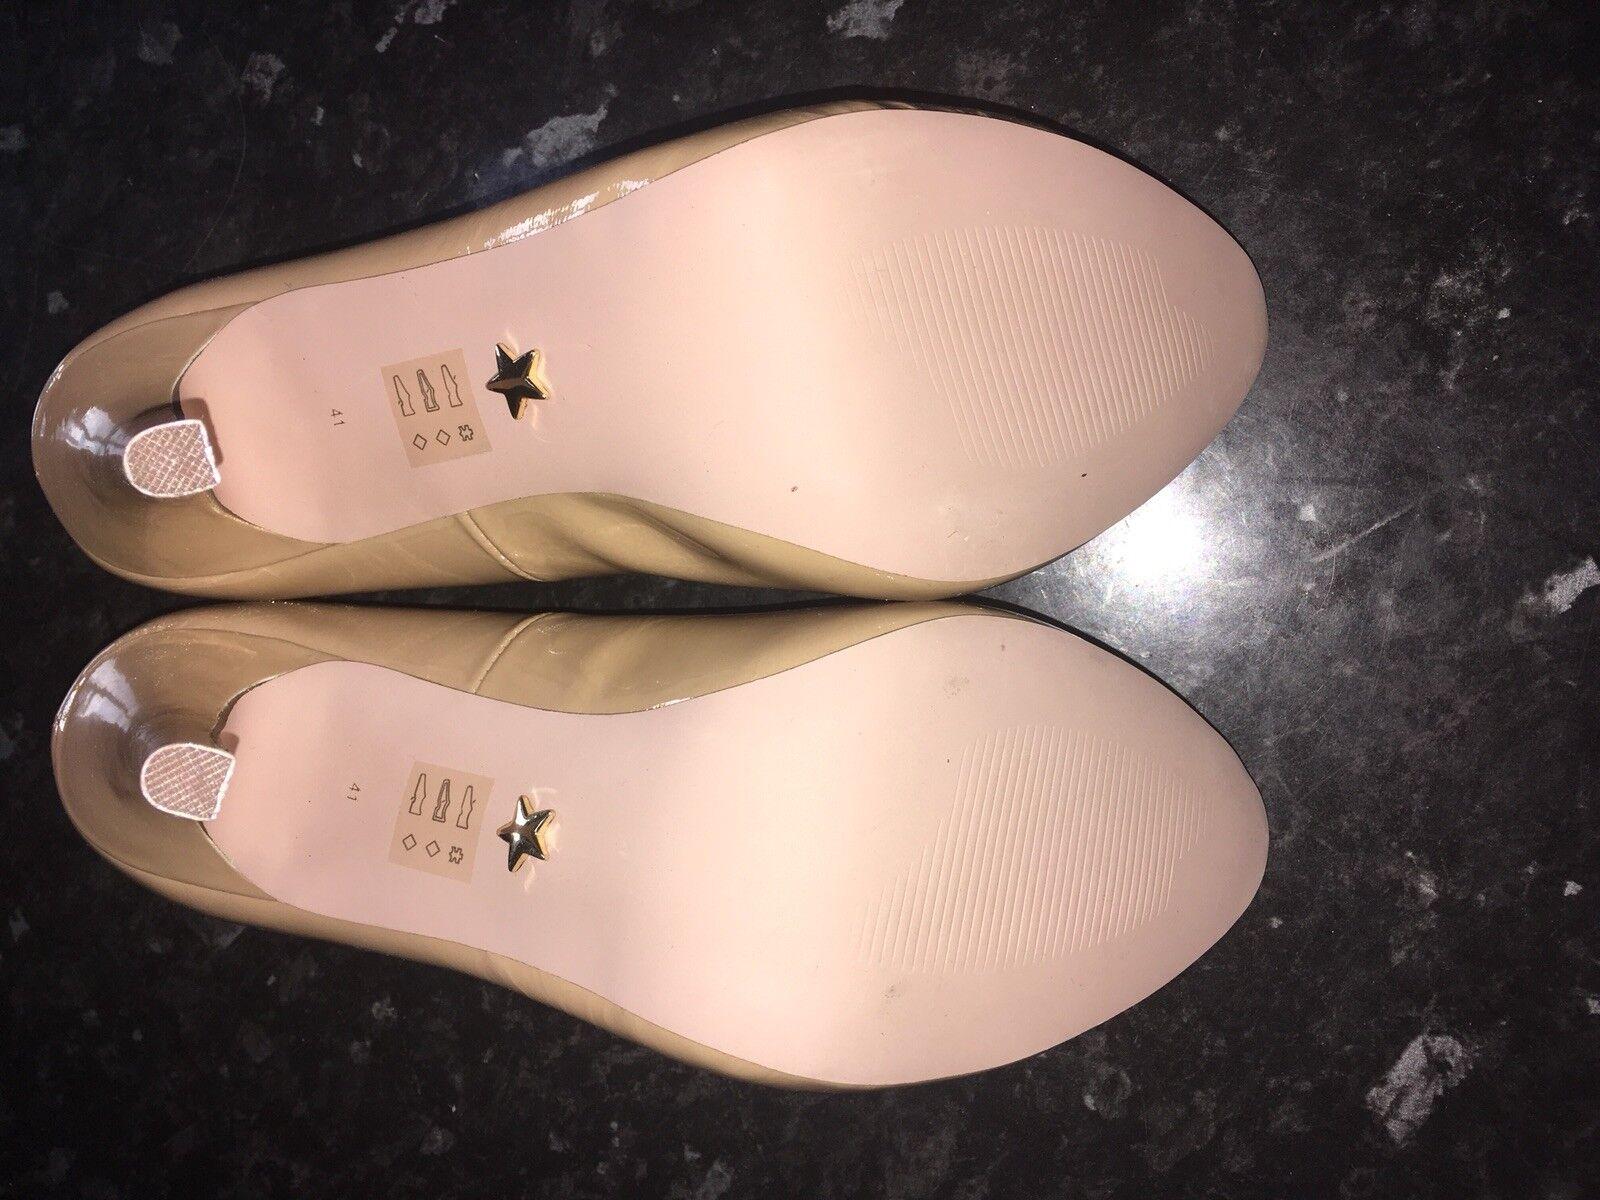 Kurt Geiger Nude P&P Shoes Size 41/8 FREE P&P Nude 8e8e32